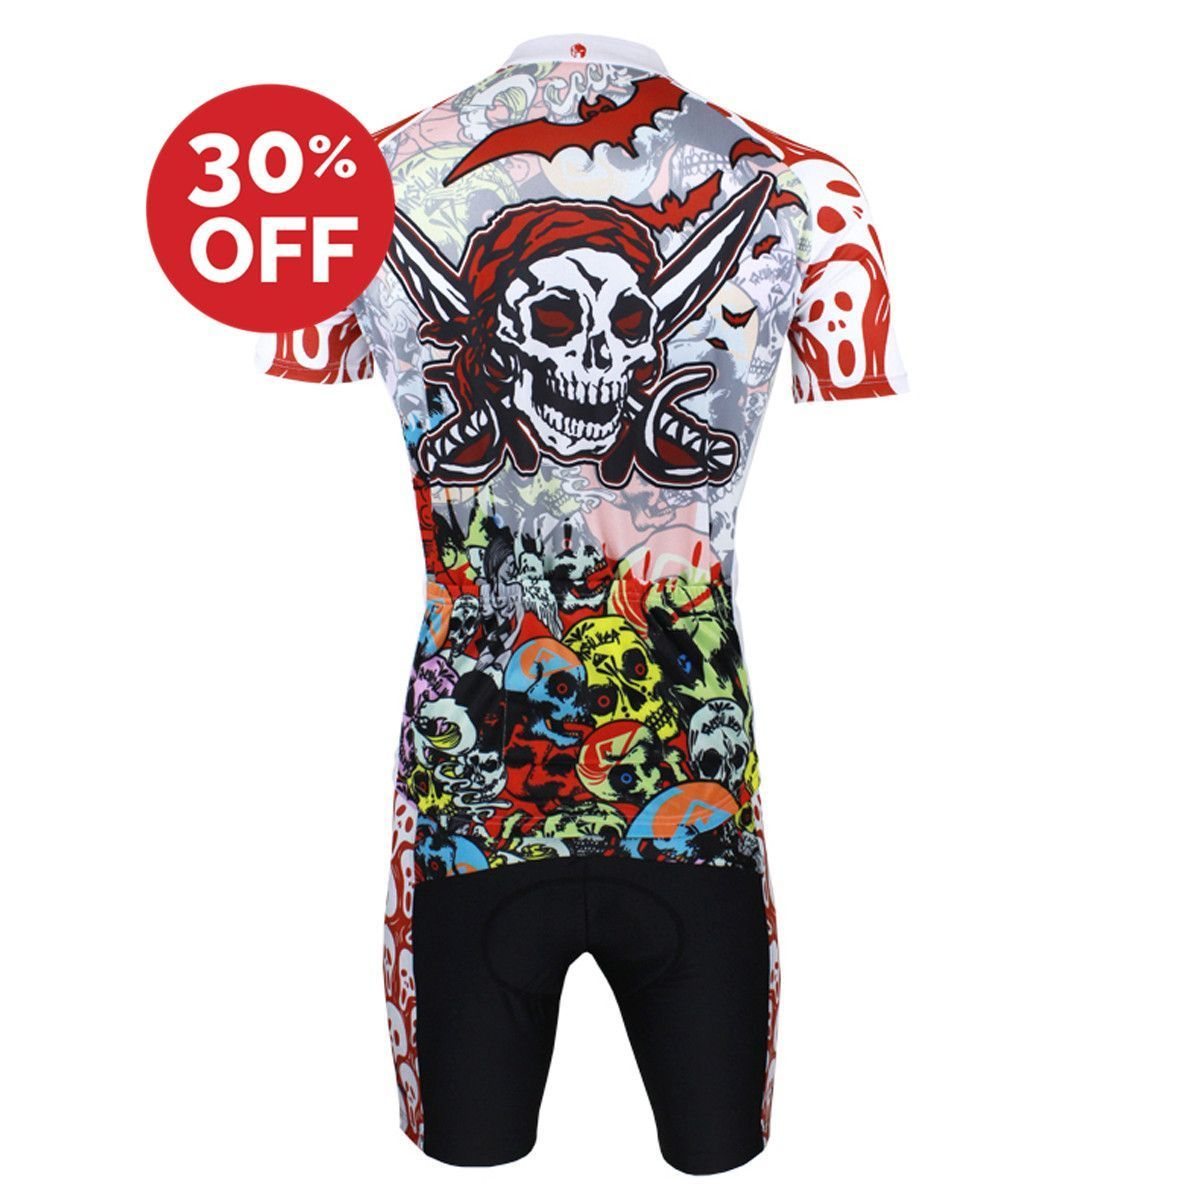 0423060e6d9 discount cycling jerseys